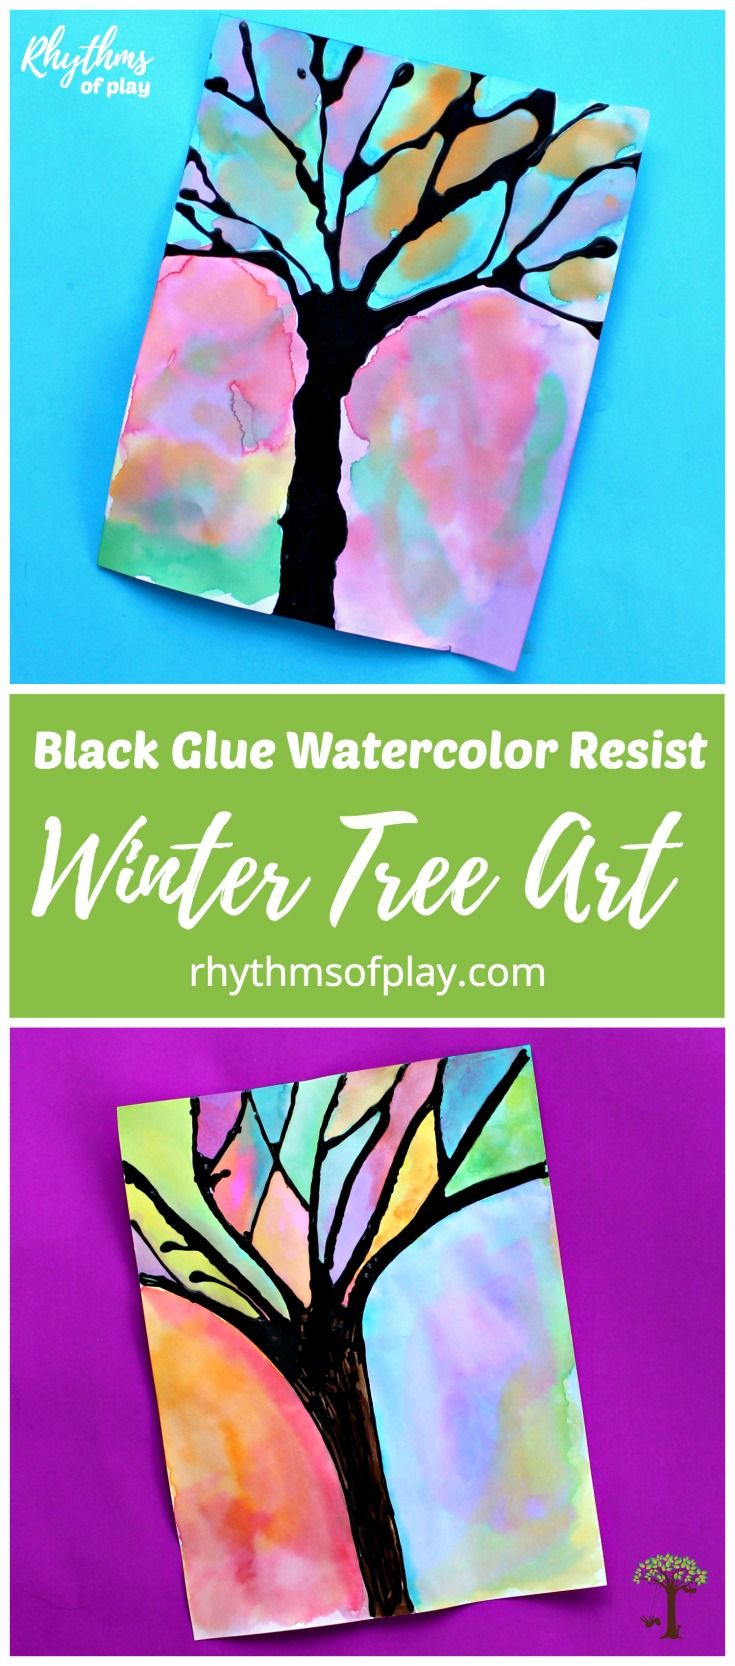 Winter Tree Black Glue Watercolor Resist Art Project